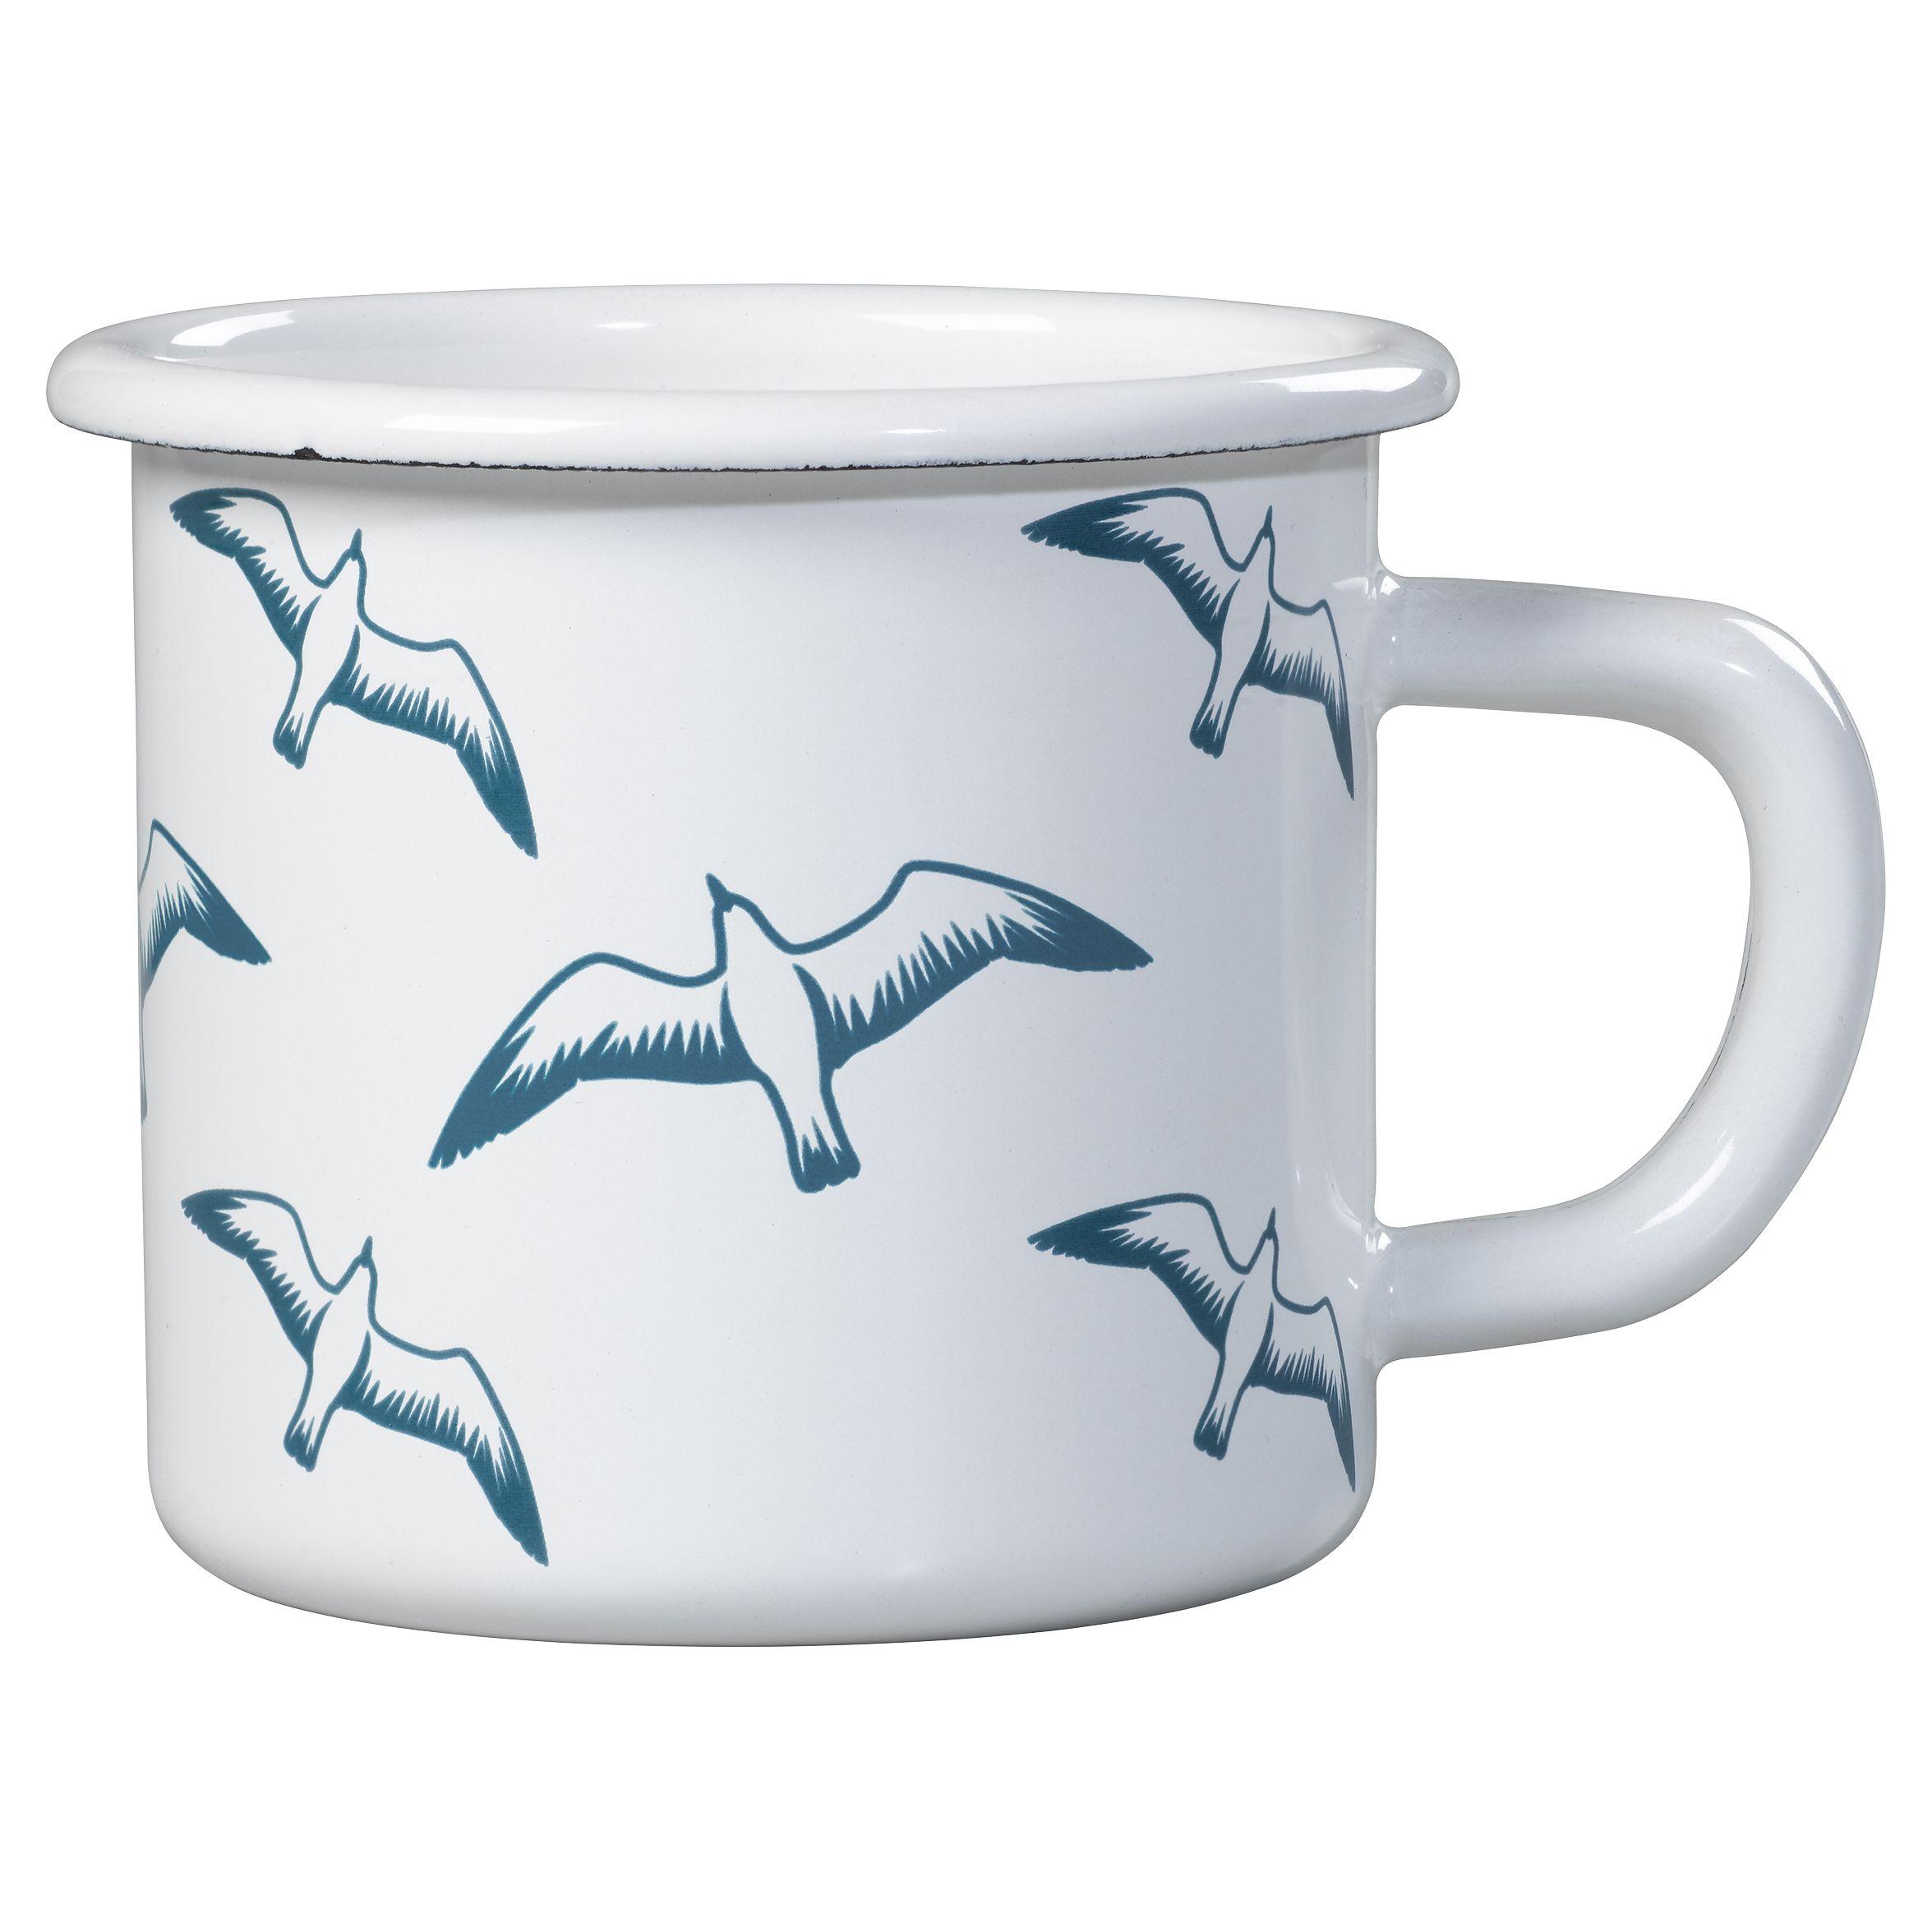 Mini Moderns Mini Moderns Whitby Seagulls Mug, Enamel